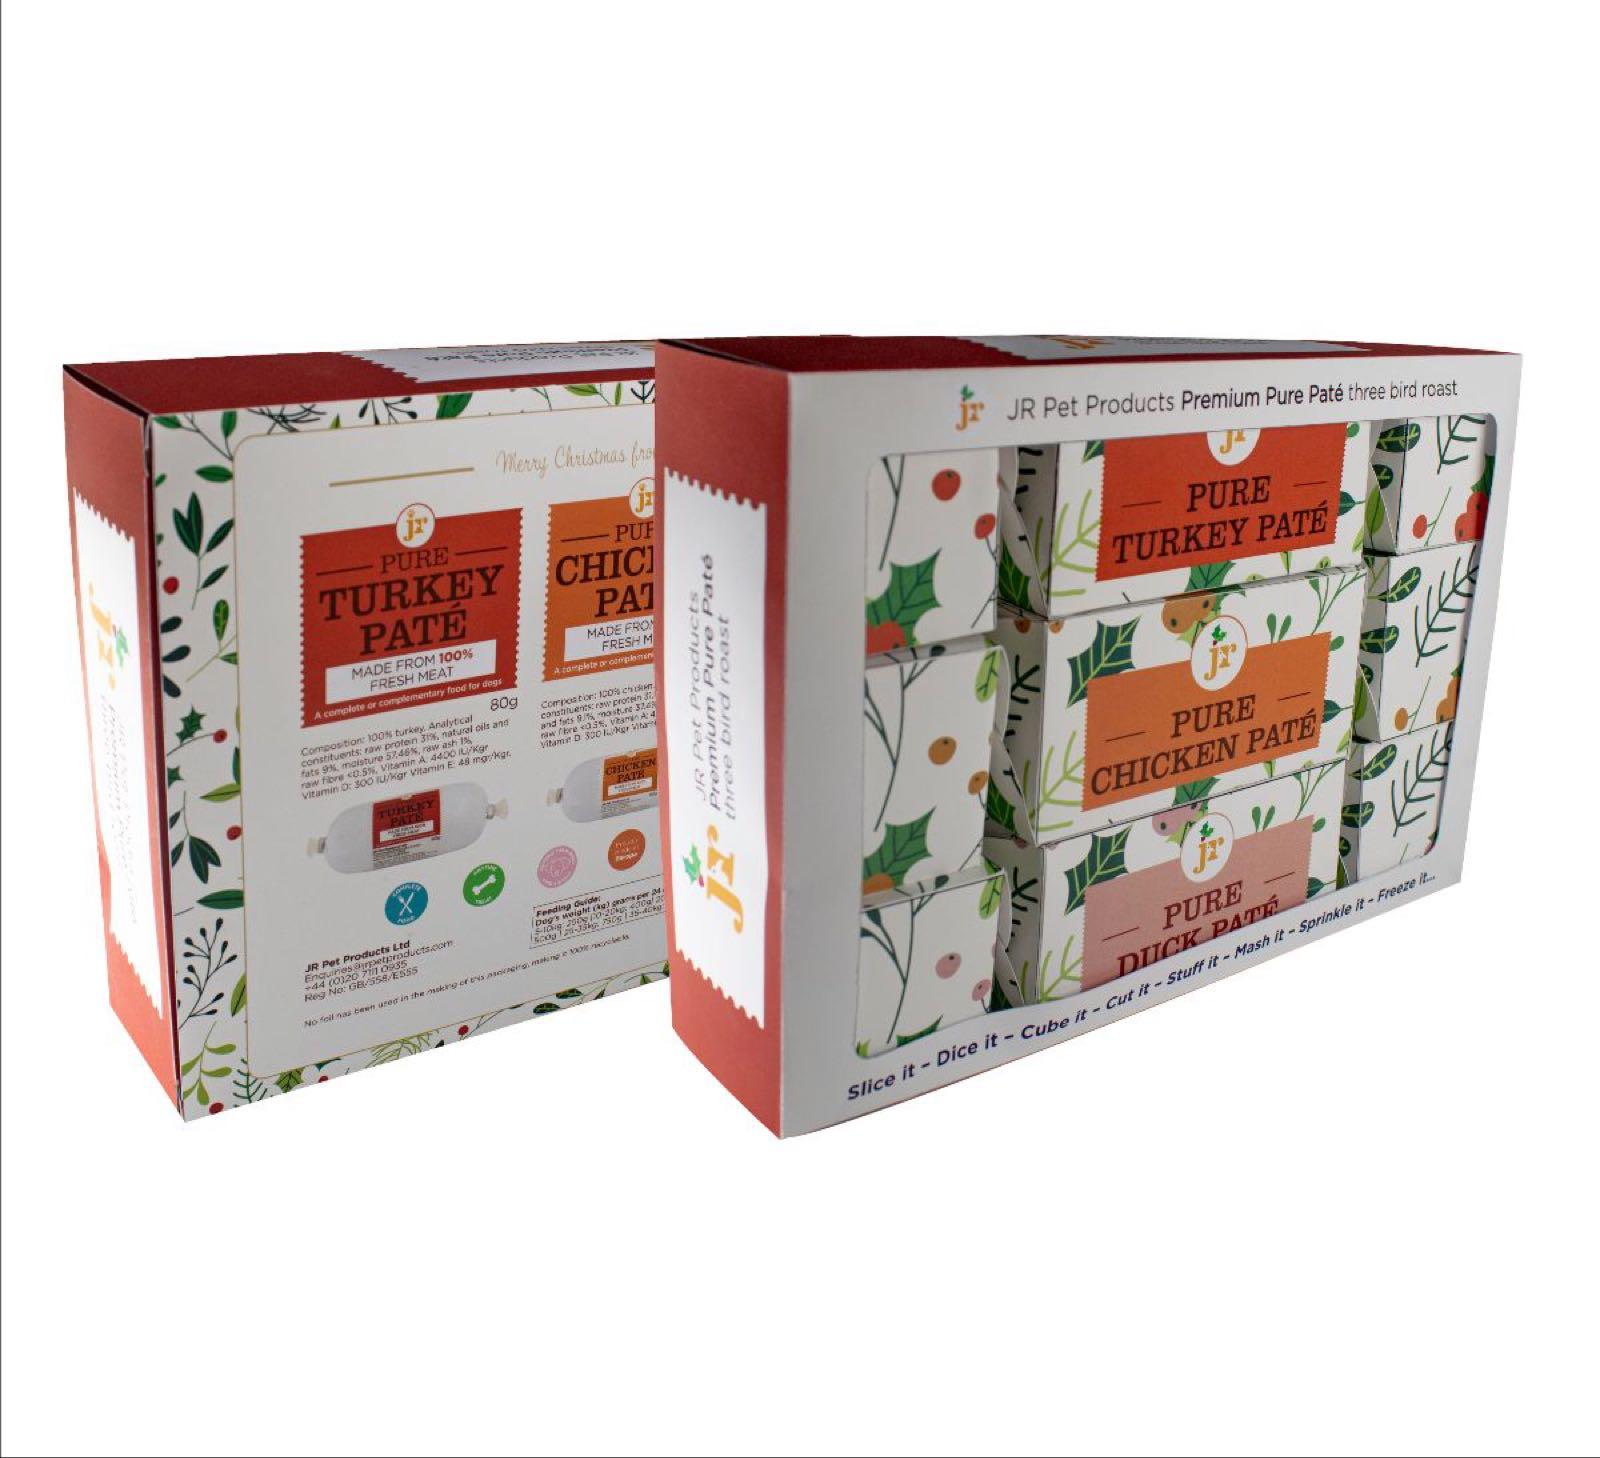 Christmas Crackers (3 bird roast)